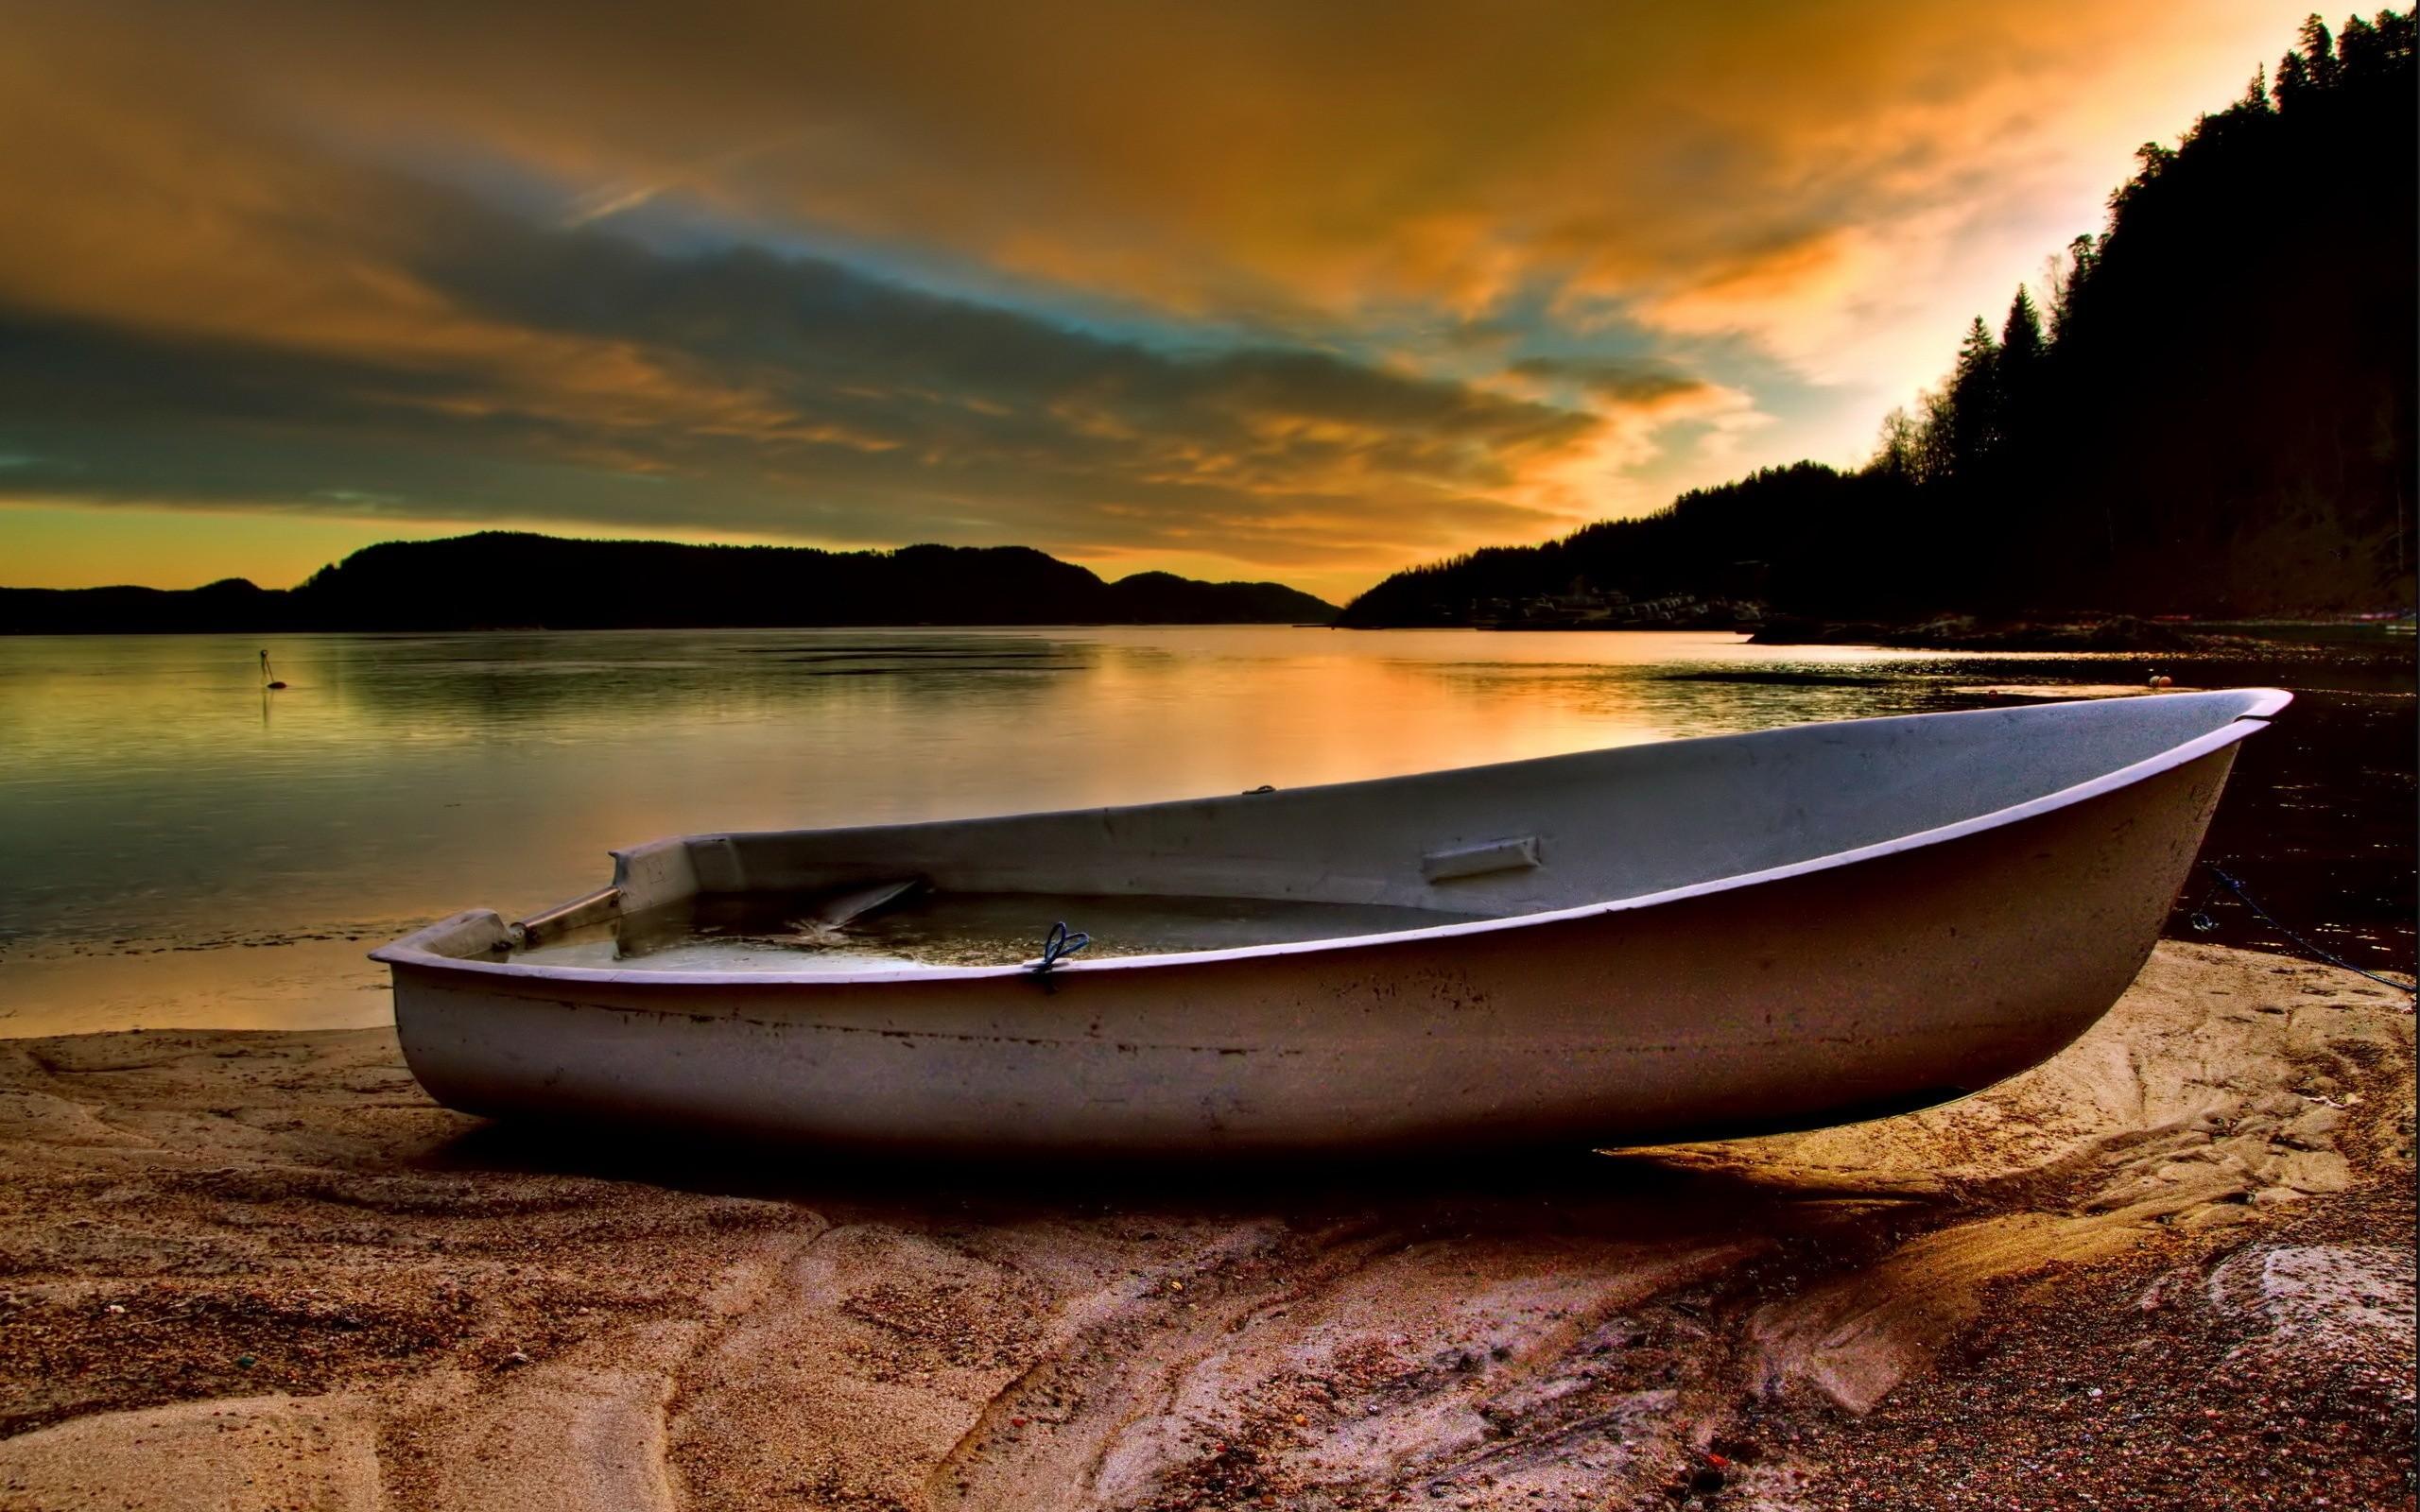 Boat Wallpaper 9151 2560x1600 px HDWallSourcecom